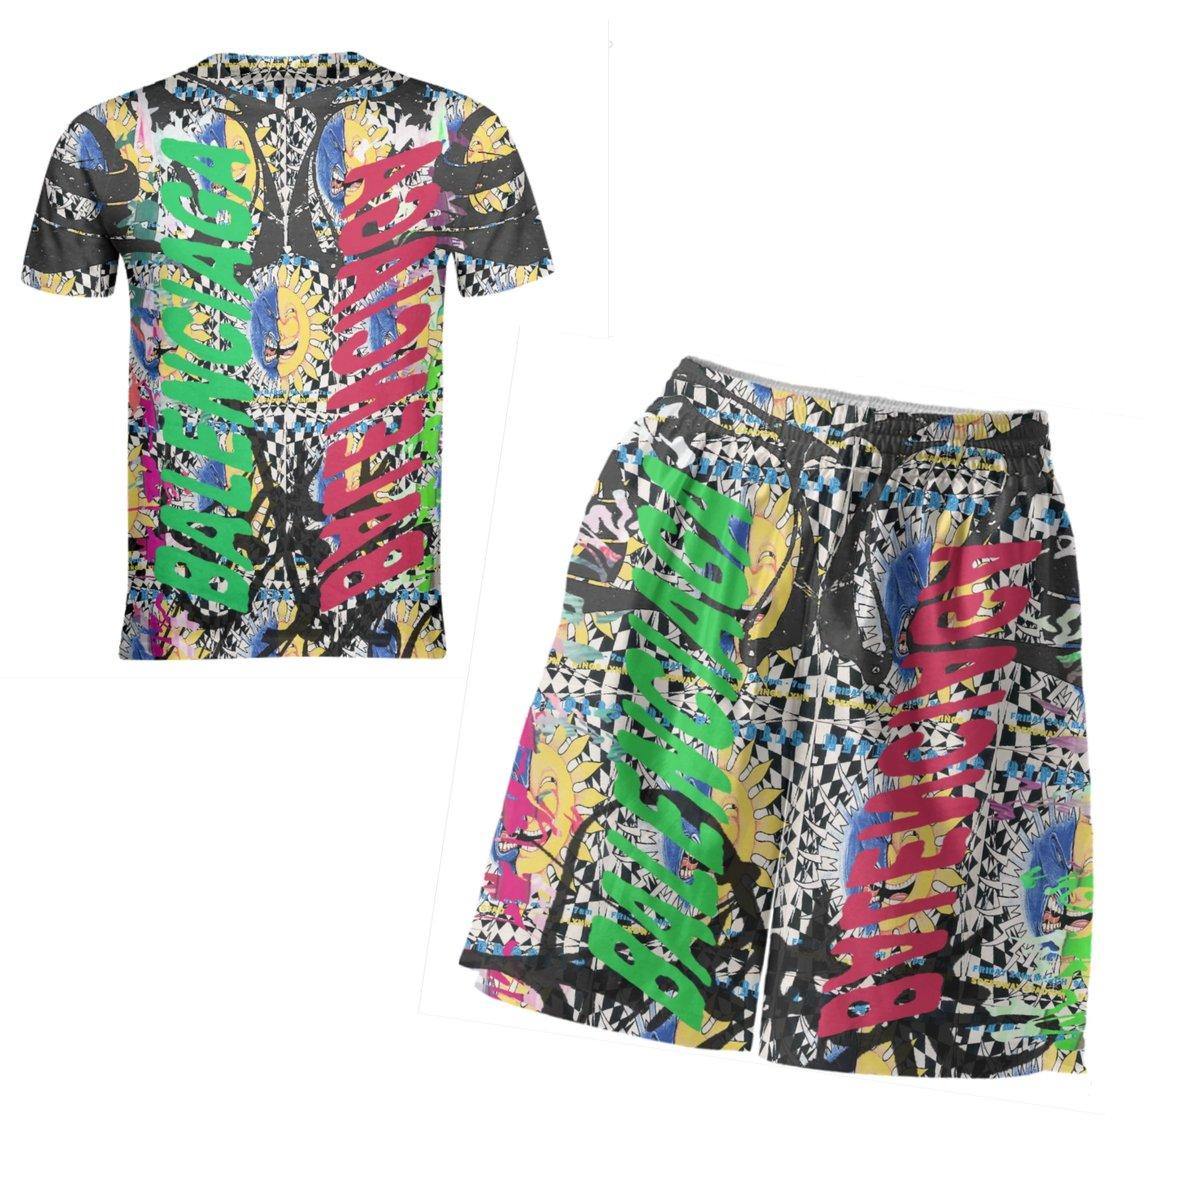 Image of Any Shorts + T Shirt Combo